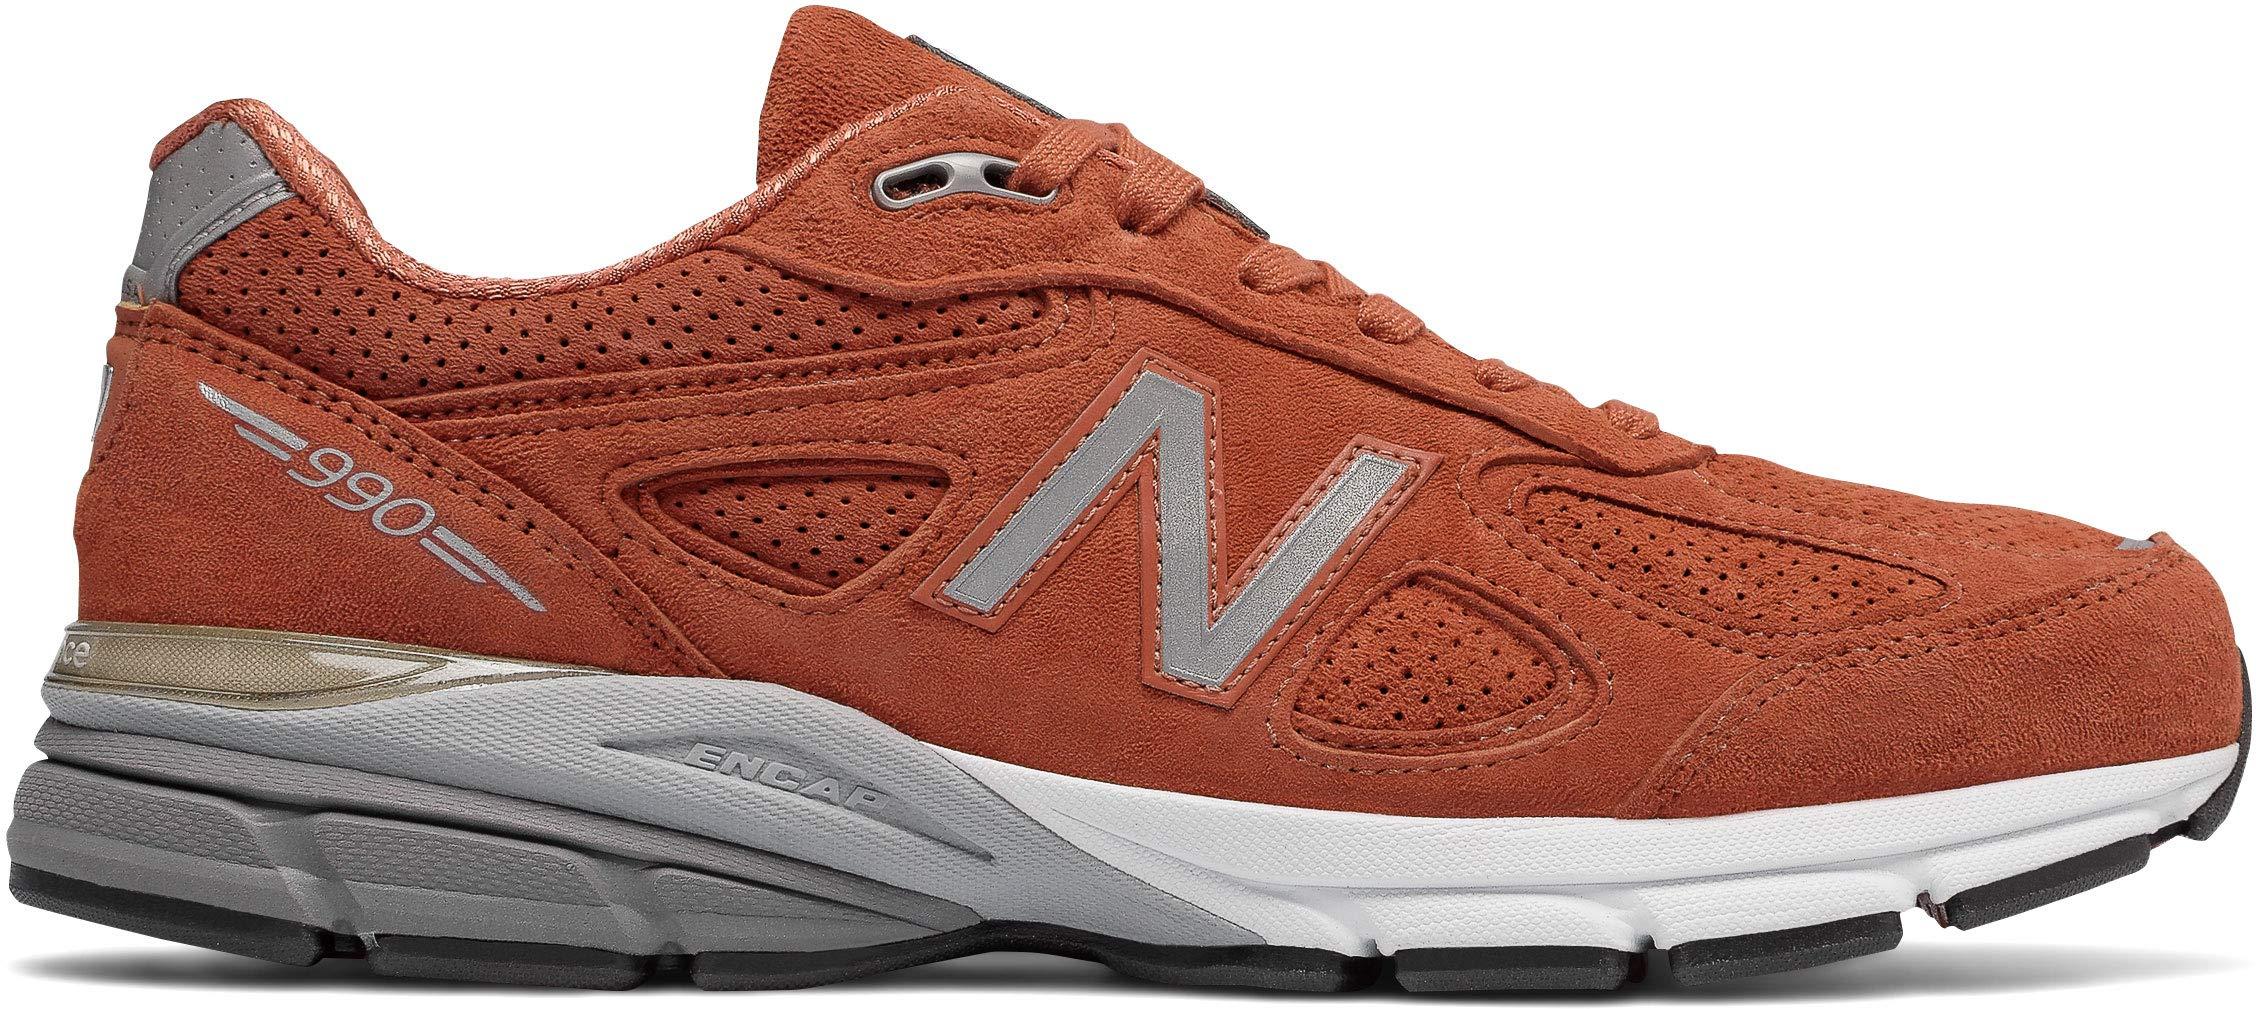 New Balance PERFRUN 990v4 Orange